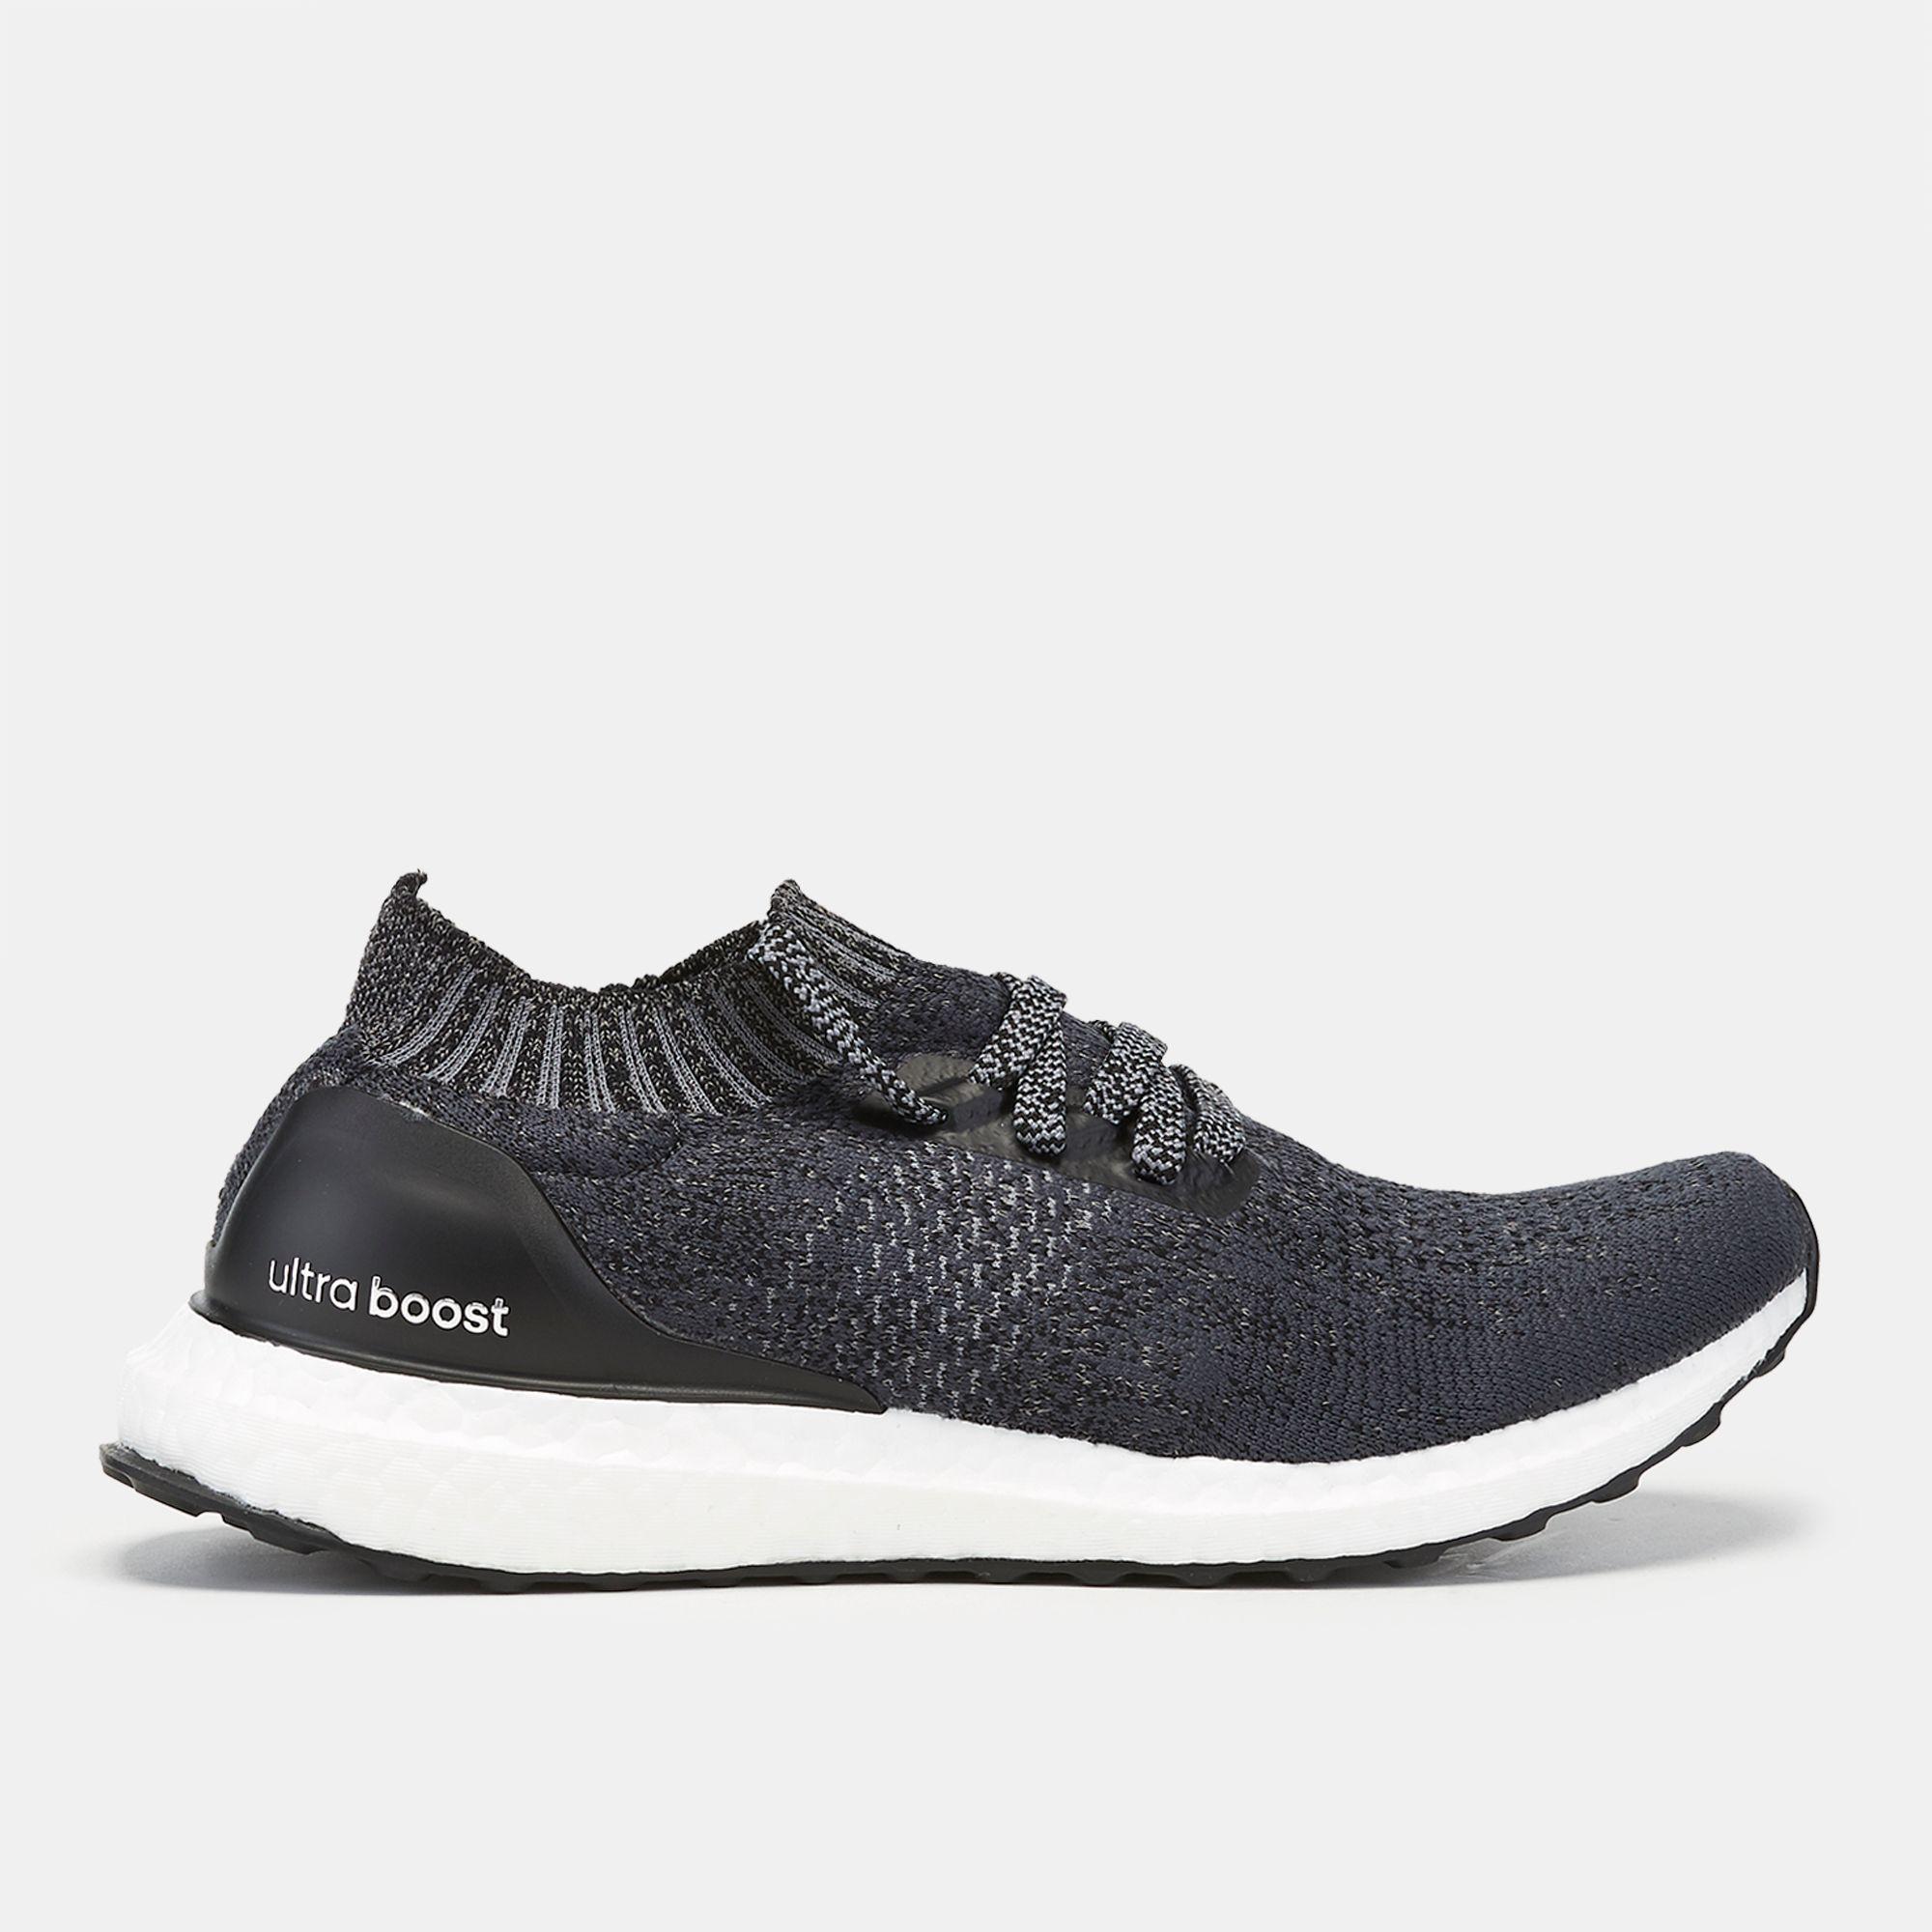 d1aa06ec0a adidas UltraBOOST Uncaged Shoe - Grey